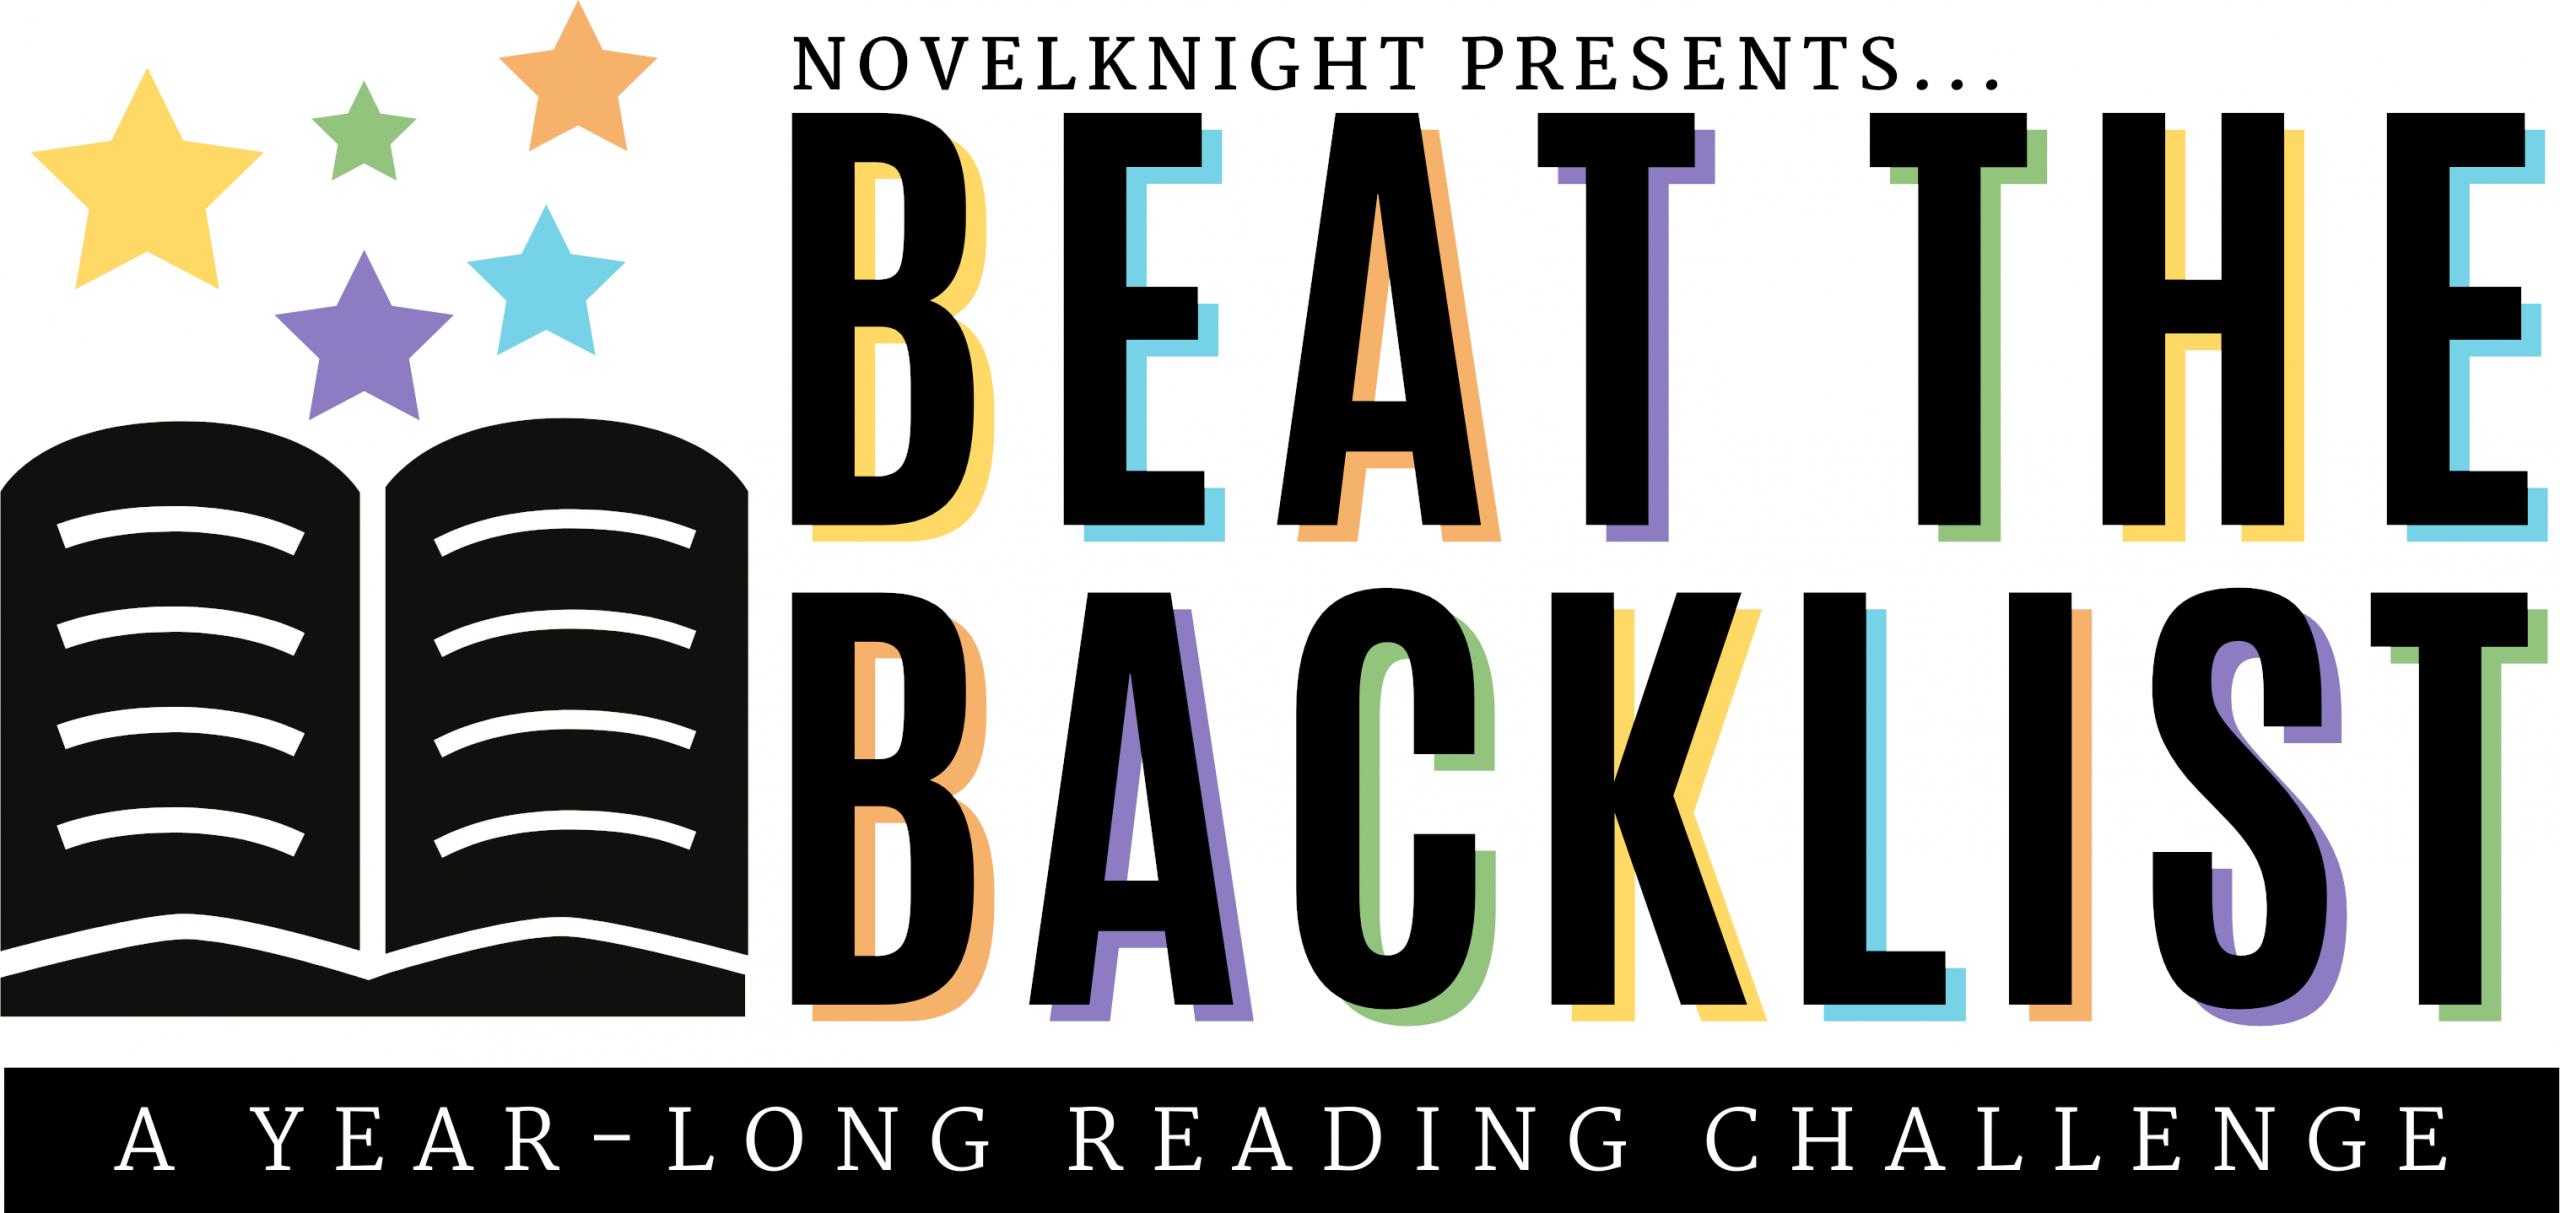 2020 Reading Challenge List.Beat The Backlist 2020 Novelknight Book Reviews